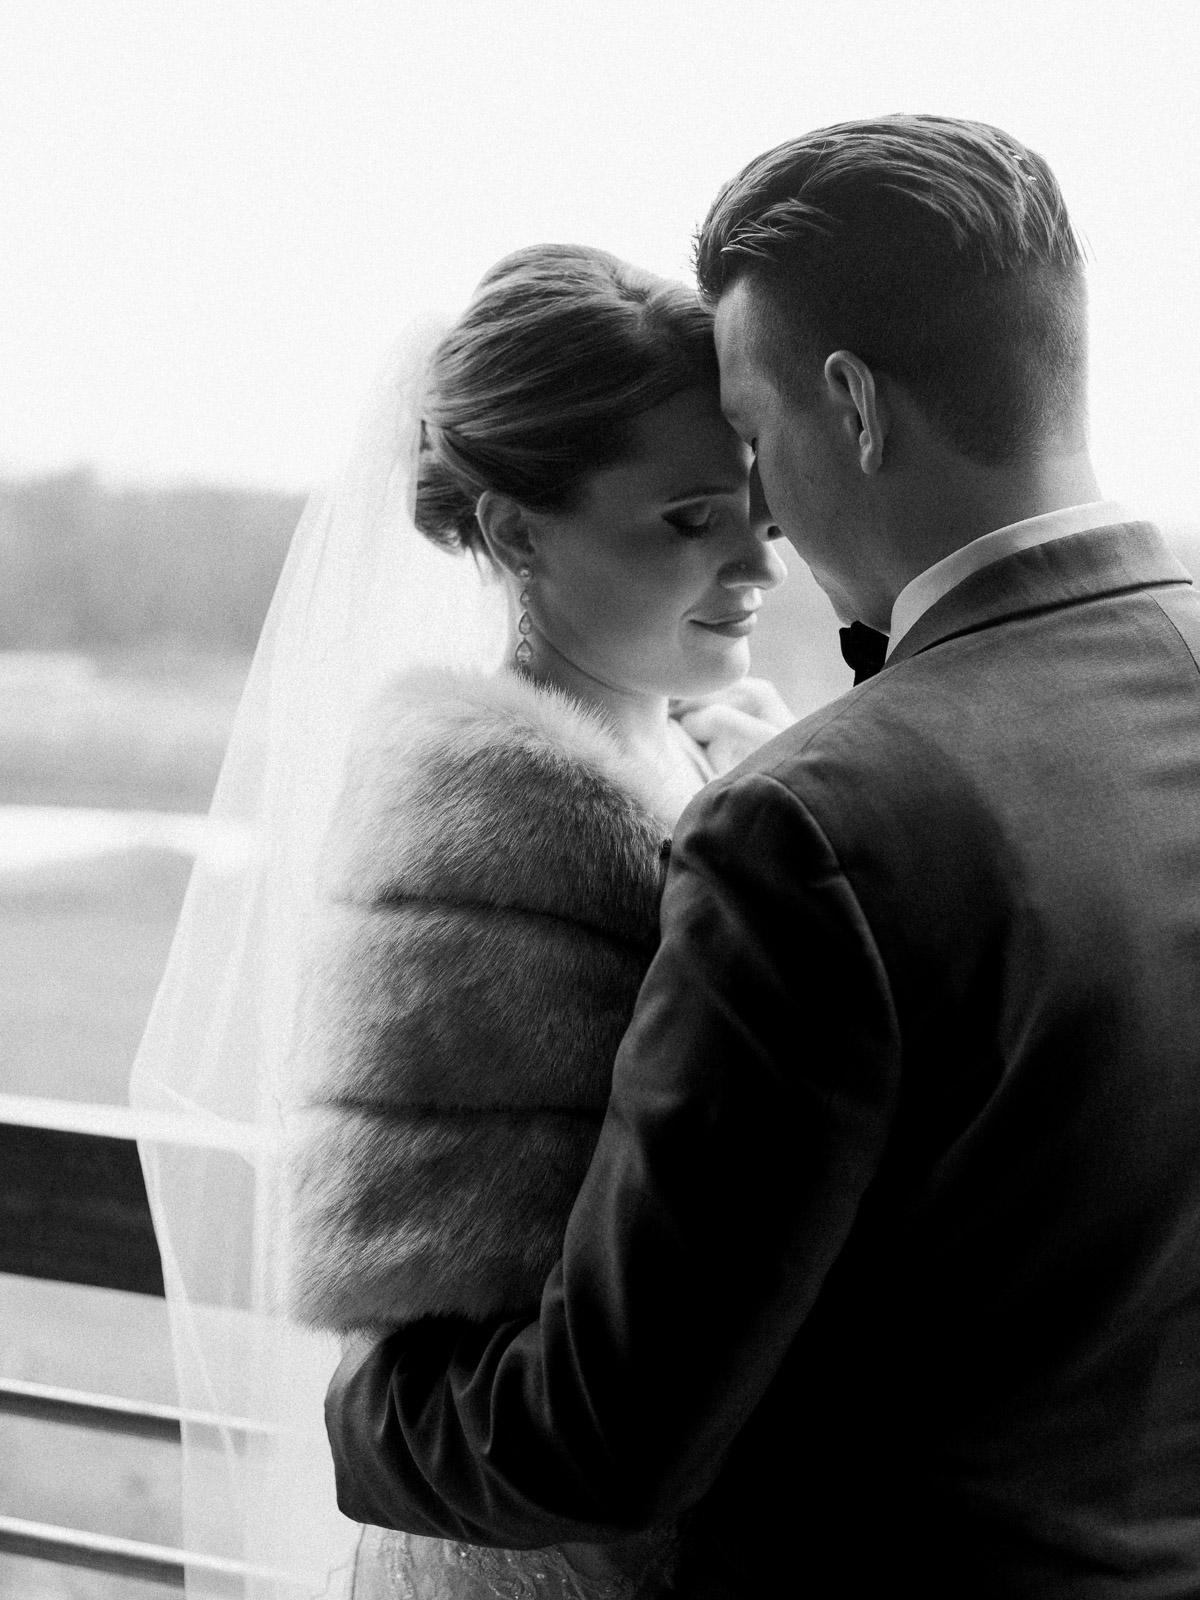 mapleside-farms-cleveland-wedding-photography-matt-erickson-photography-8.jpg